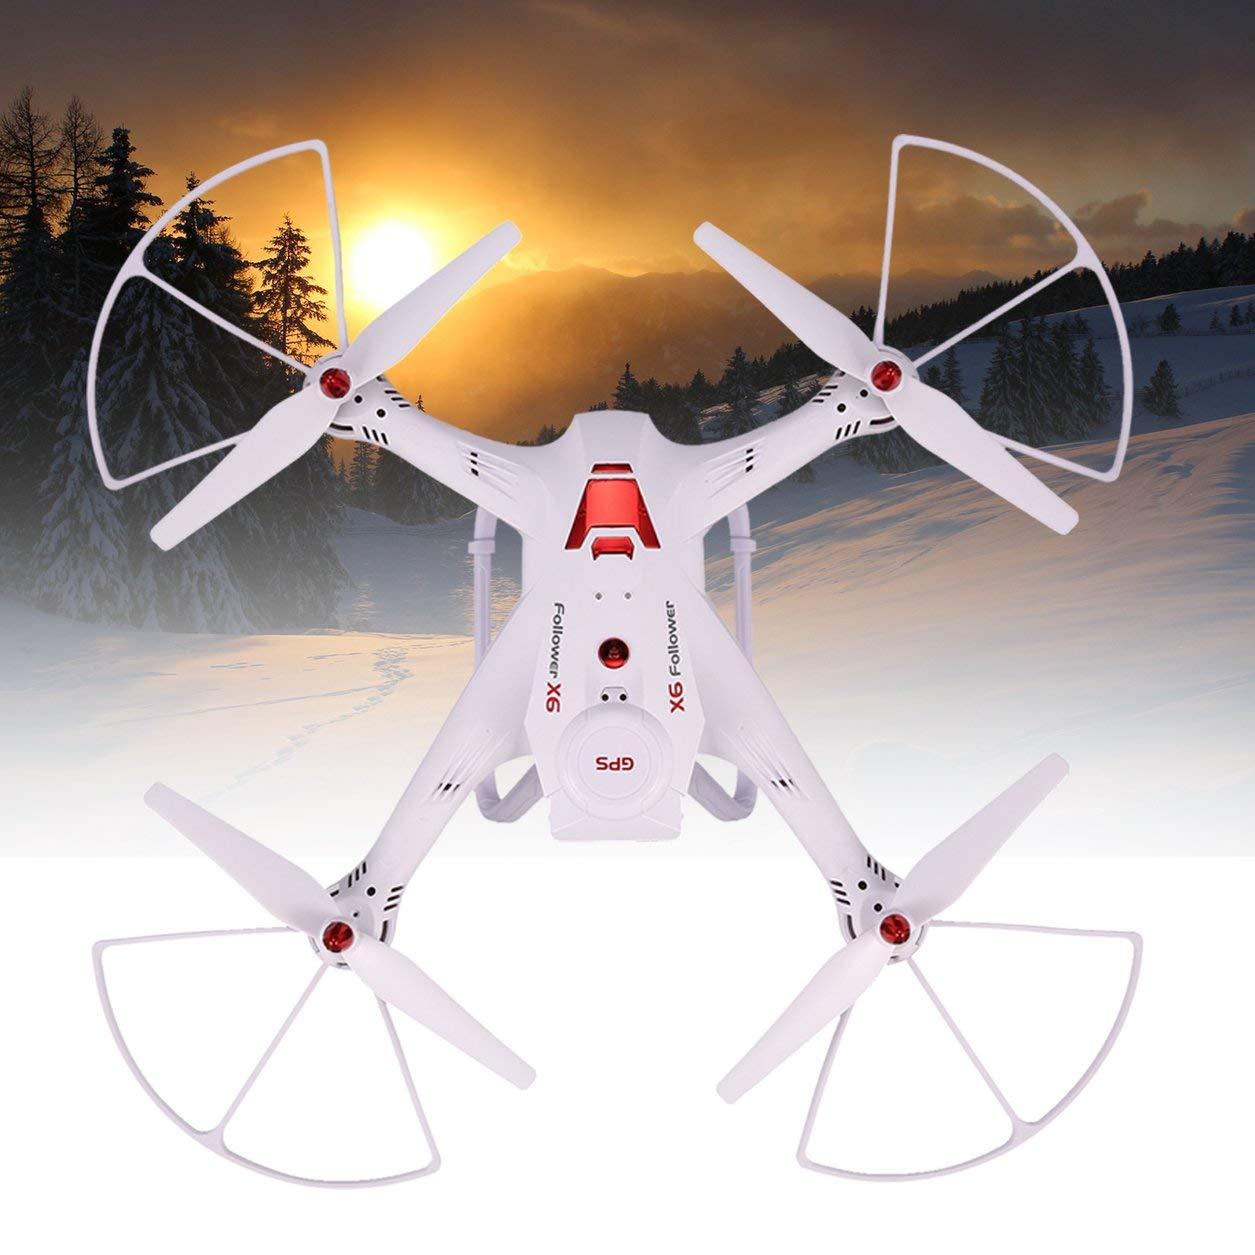 Dailyinshop Global Drone X183S GPS Sin escobillas 5G WiFi 1080P Cámara FPV Drone RC Sígueme (Color: Blanco)